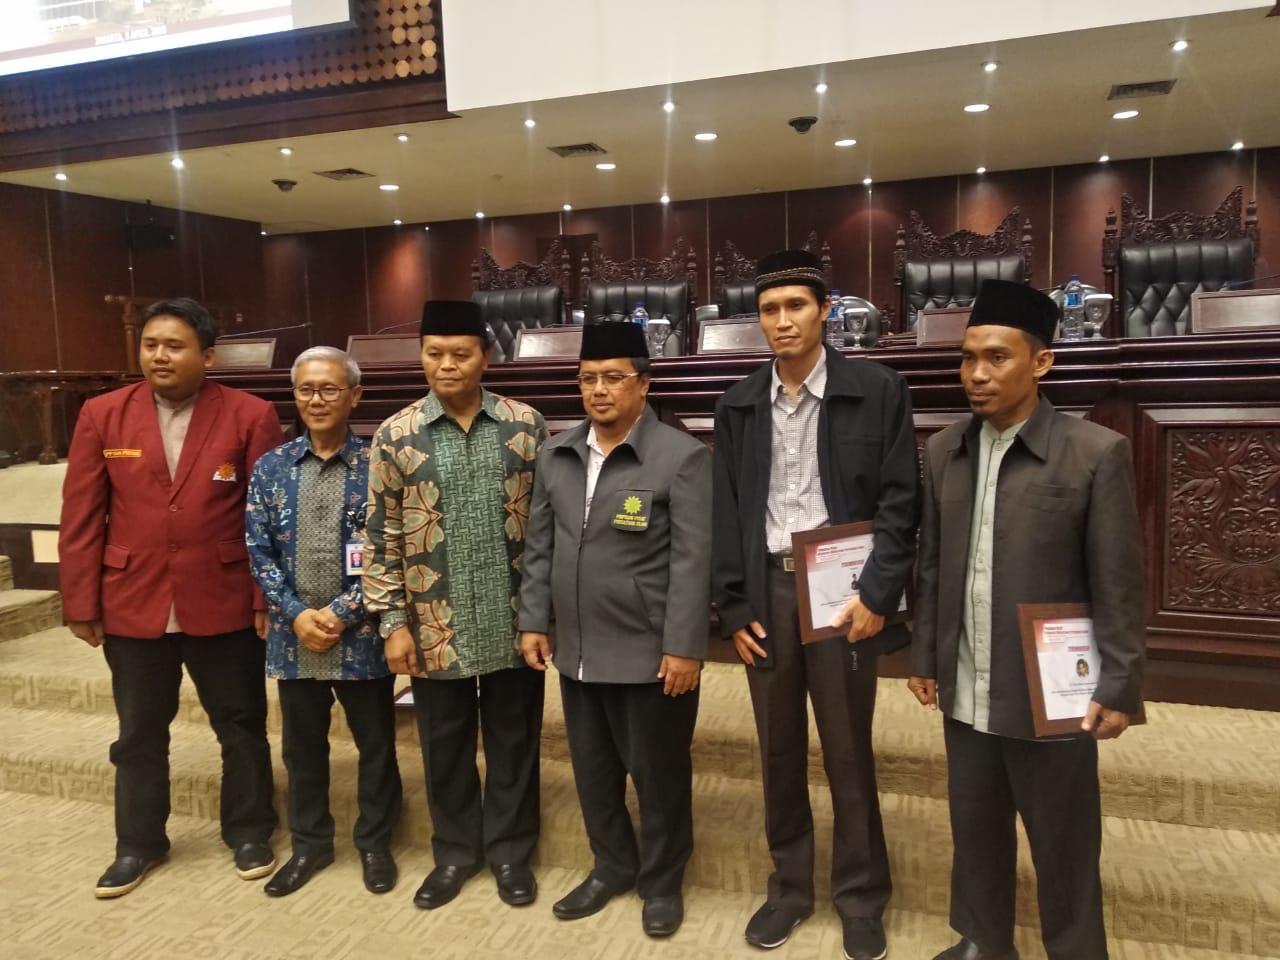 DAKWAH ISLAM INDONESIA DALAM PENGABDIAN DAN PERJUANGAN MOHAMMAD NATSIR